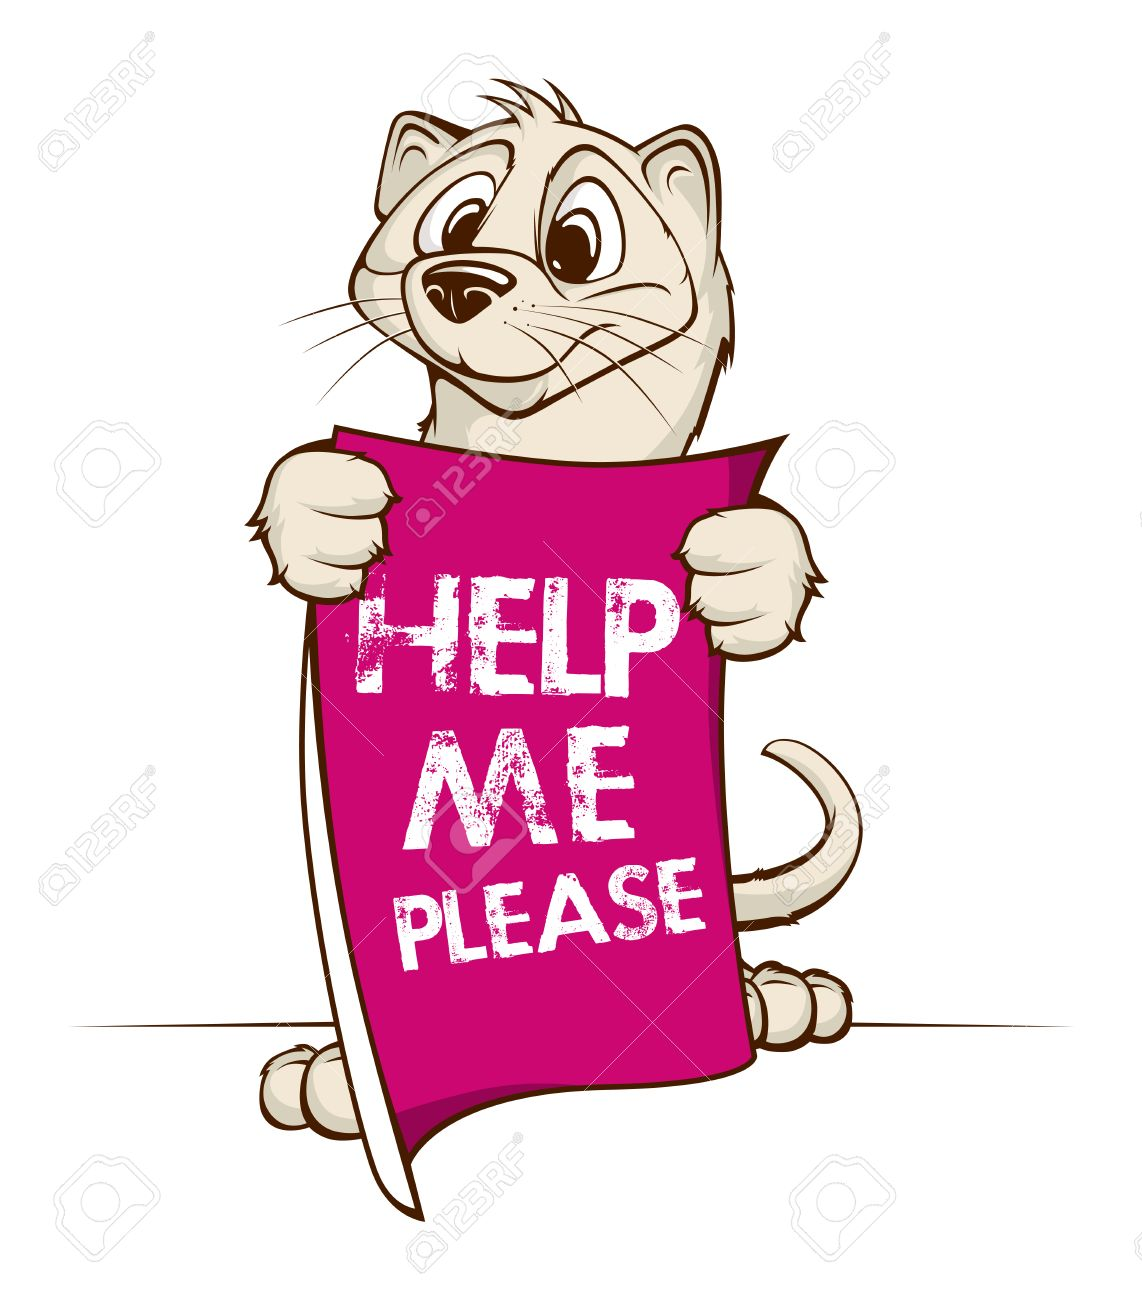 Help me............?